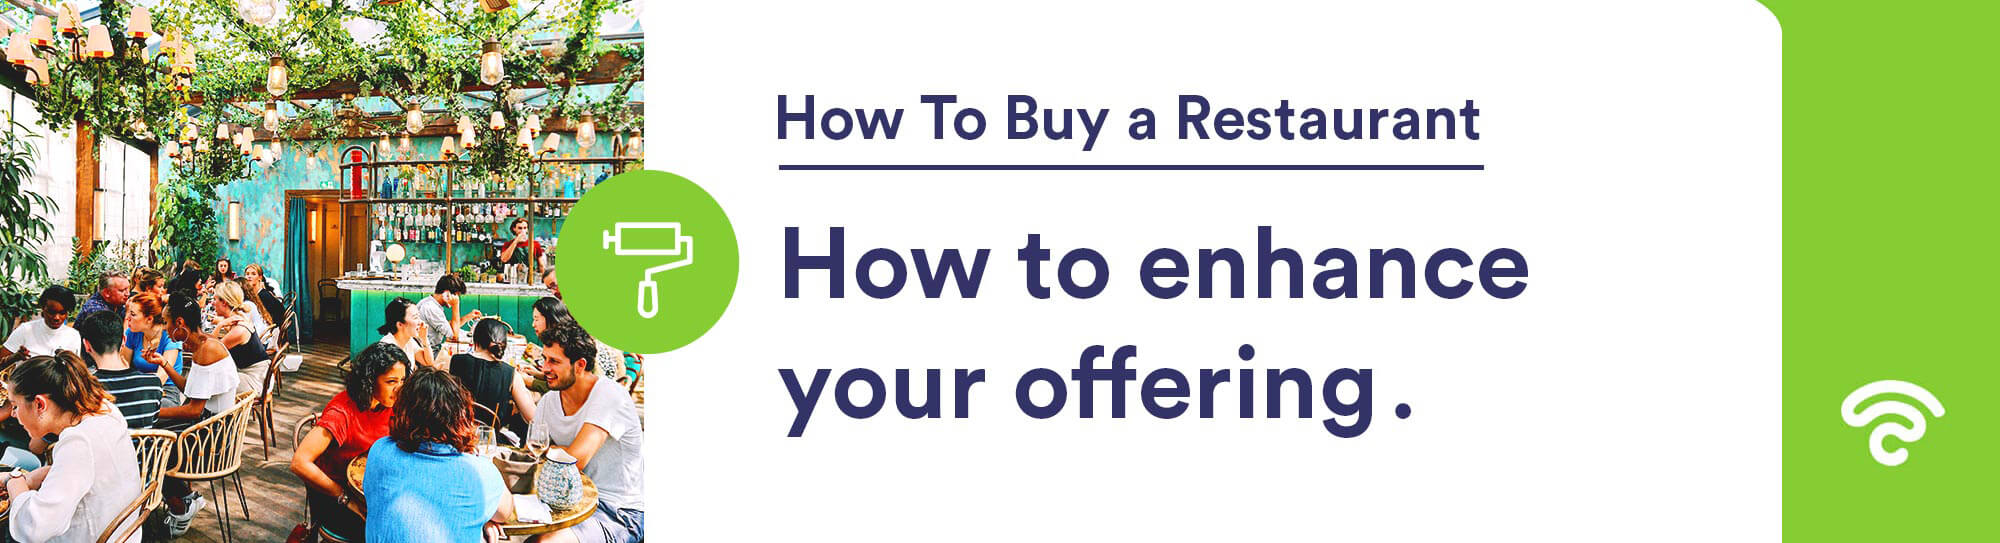 how to enhance restaurant offering